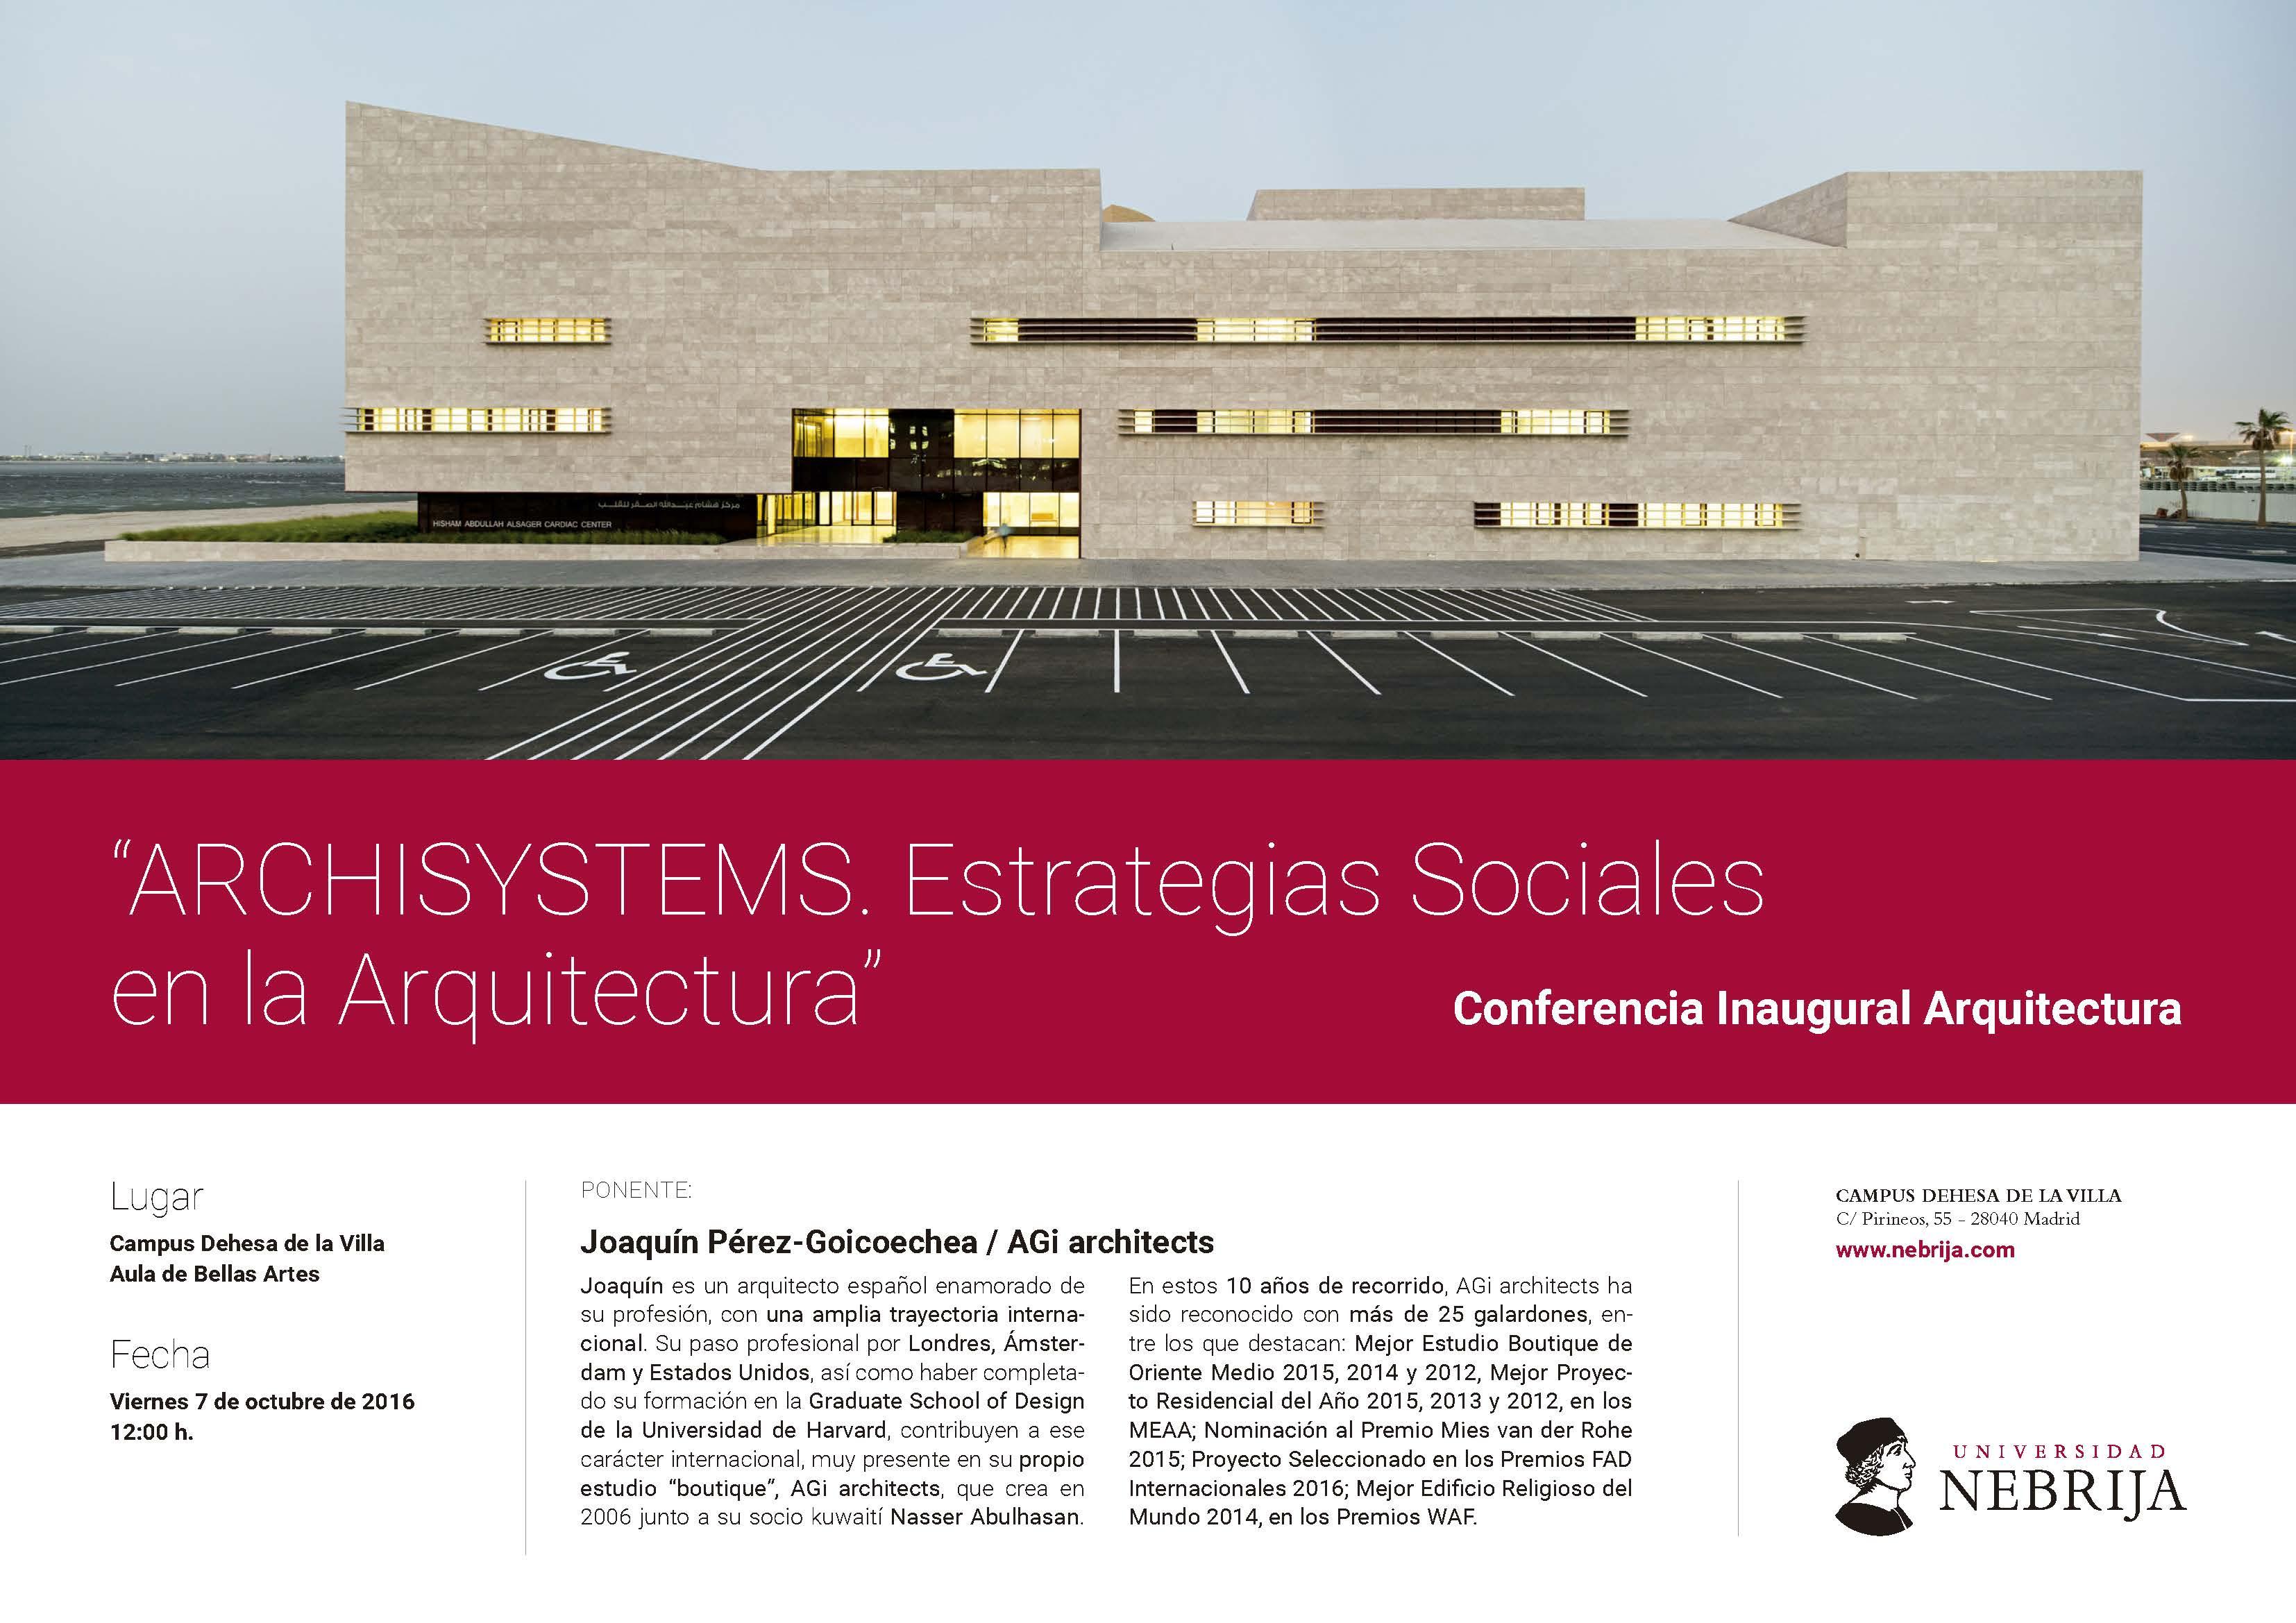 inauguracion_archisystems